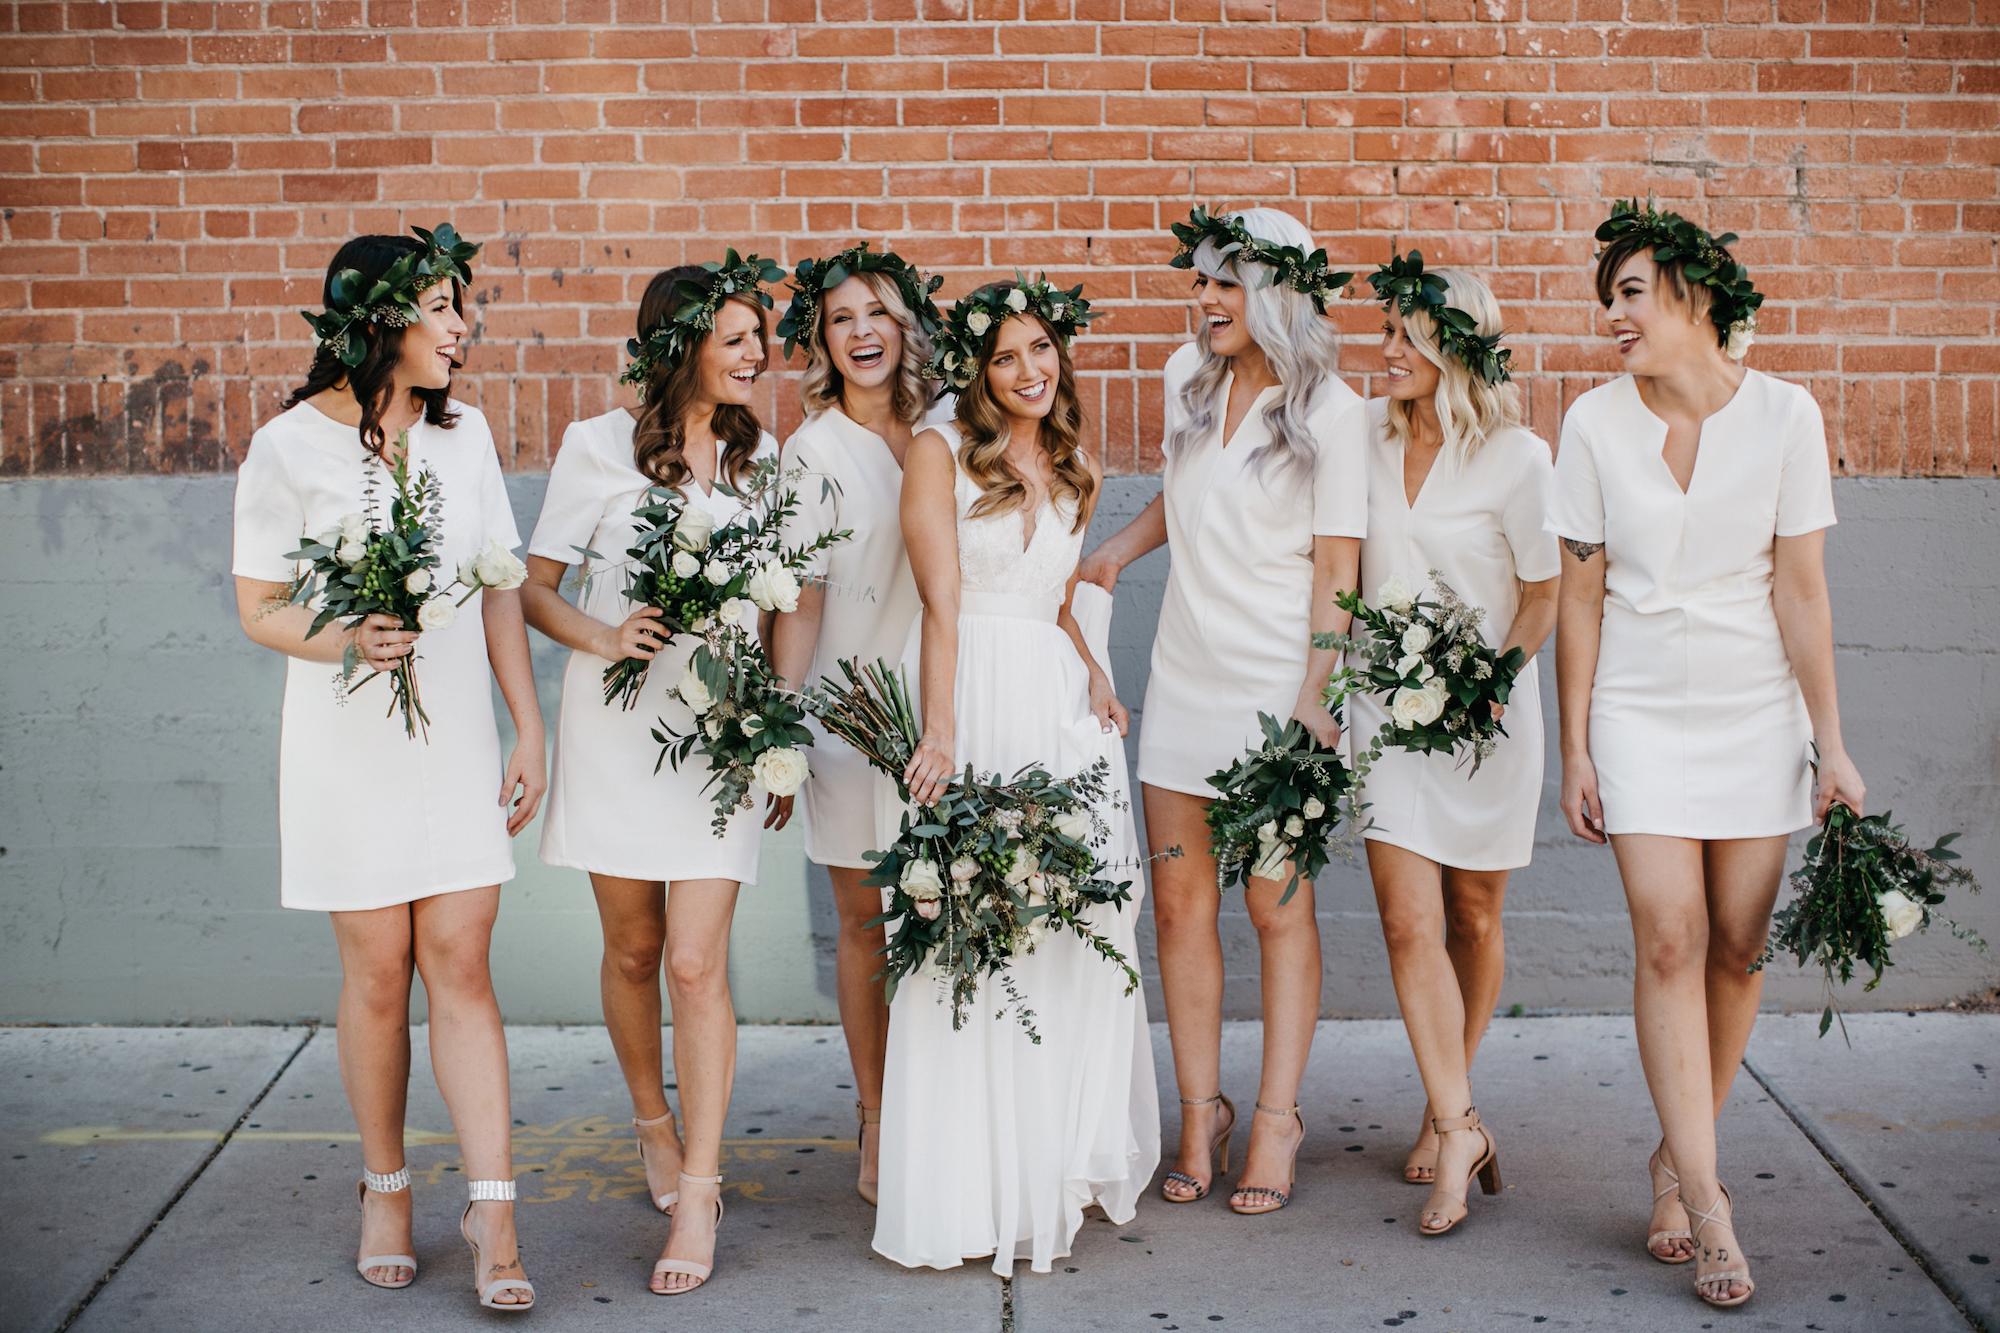 arizona - wedding - photographer 283.jpg